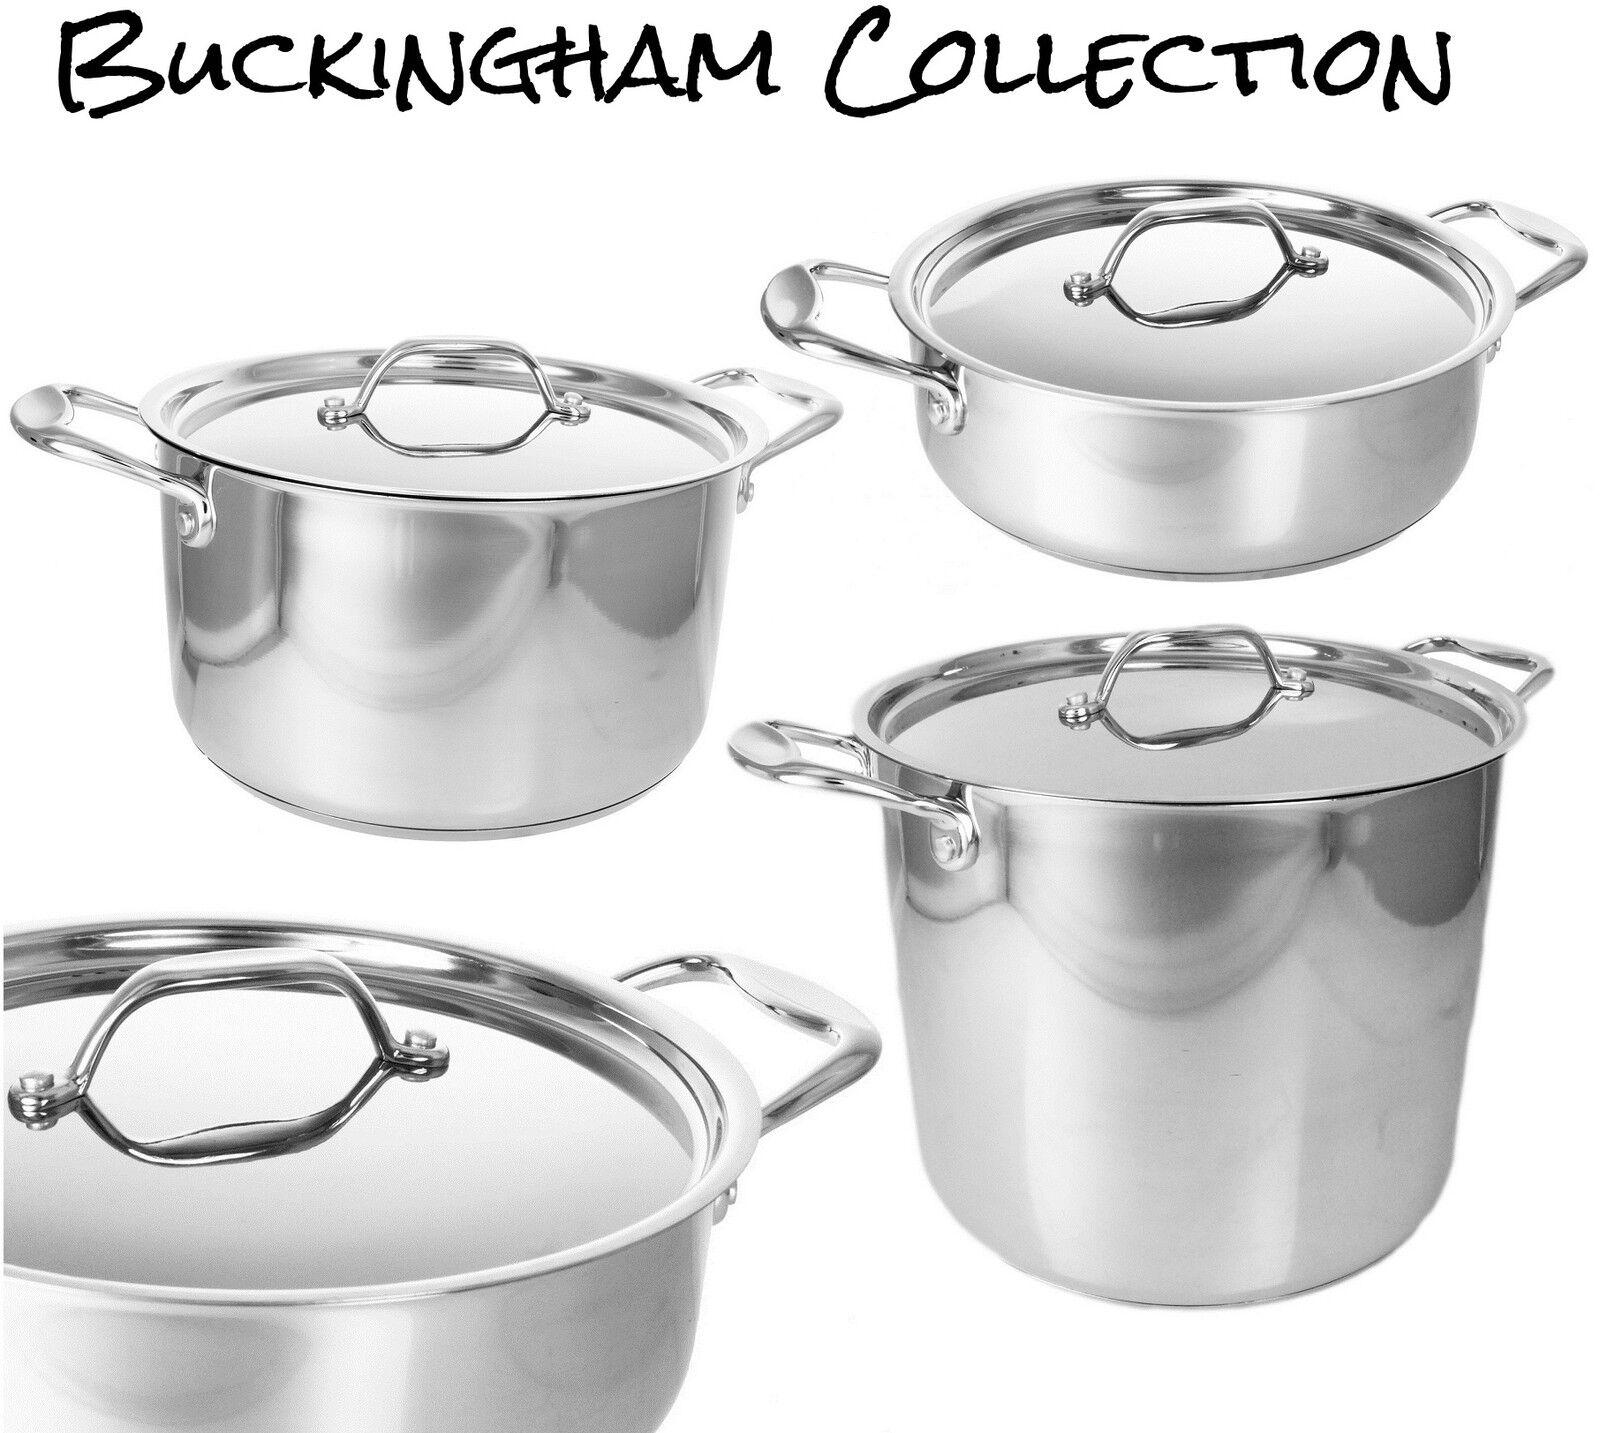 Buckingham prestage induzione S   ACCIAIO CASSEROLE STOCK Soup Pot stufato Saute Pan